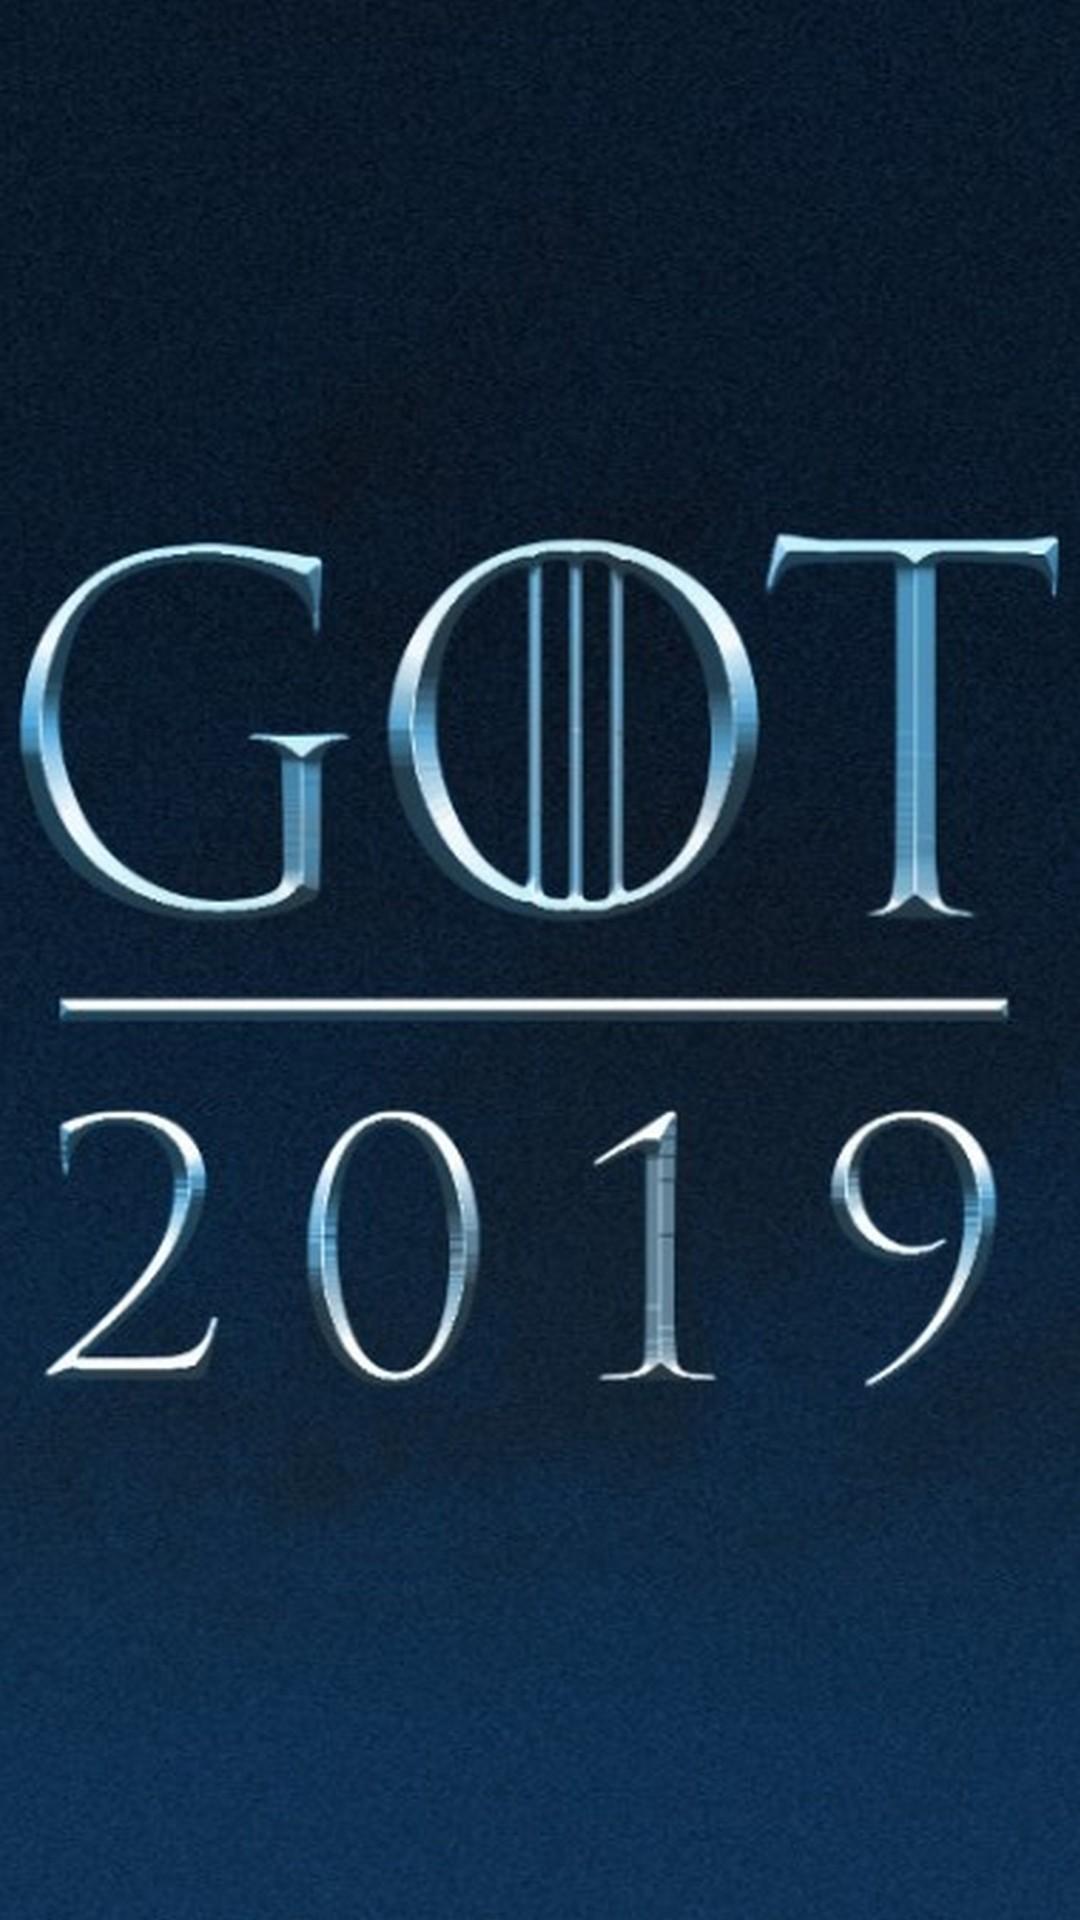 Game of Thrones Season 8 iPhone 7 Wallpaper 2019 Movie Poster 1080x1920